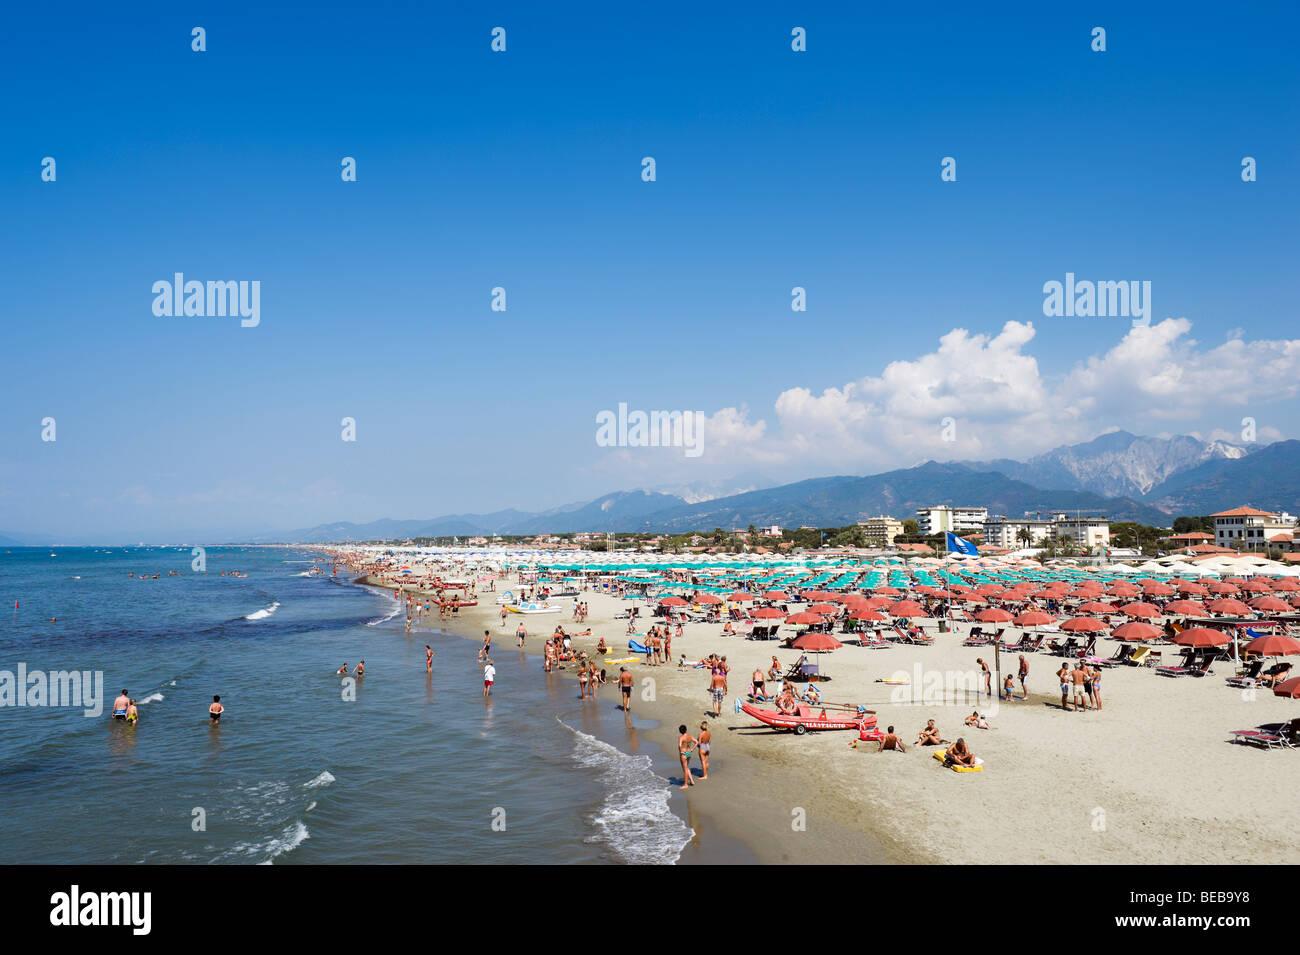 Beach at marina di pietrasanta with the town and mountains - Bagno riviera marina di pietrasanta ...